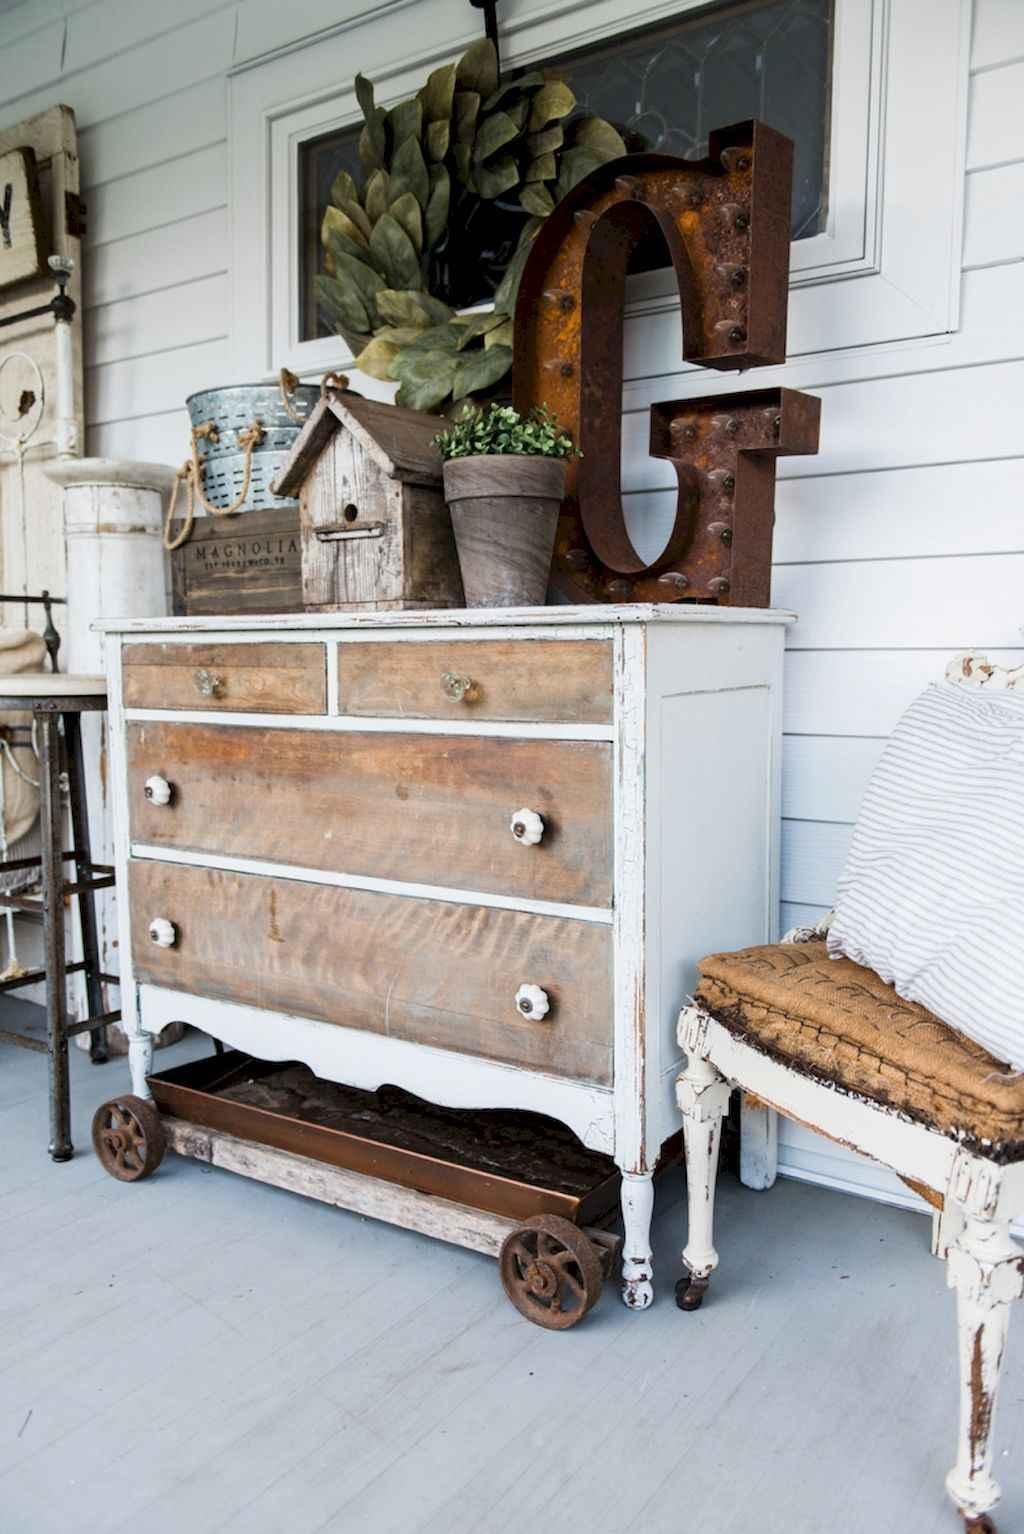 Vintage farmhouse porch ideas (71)